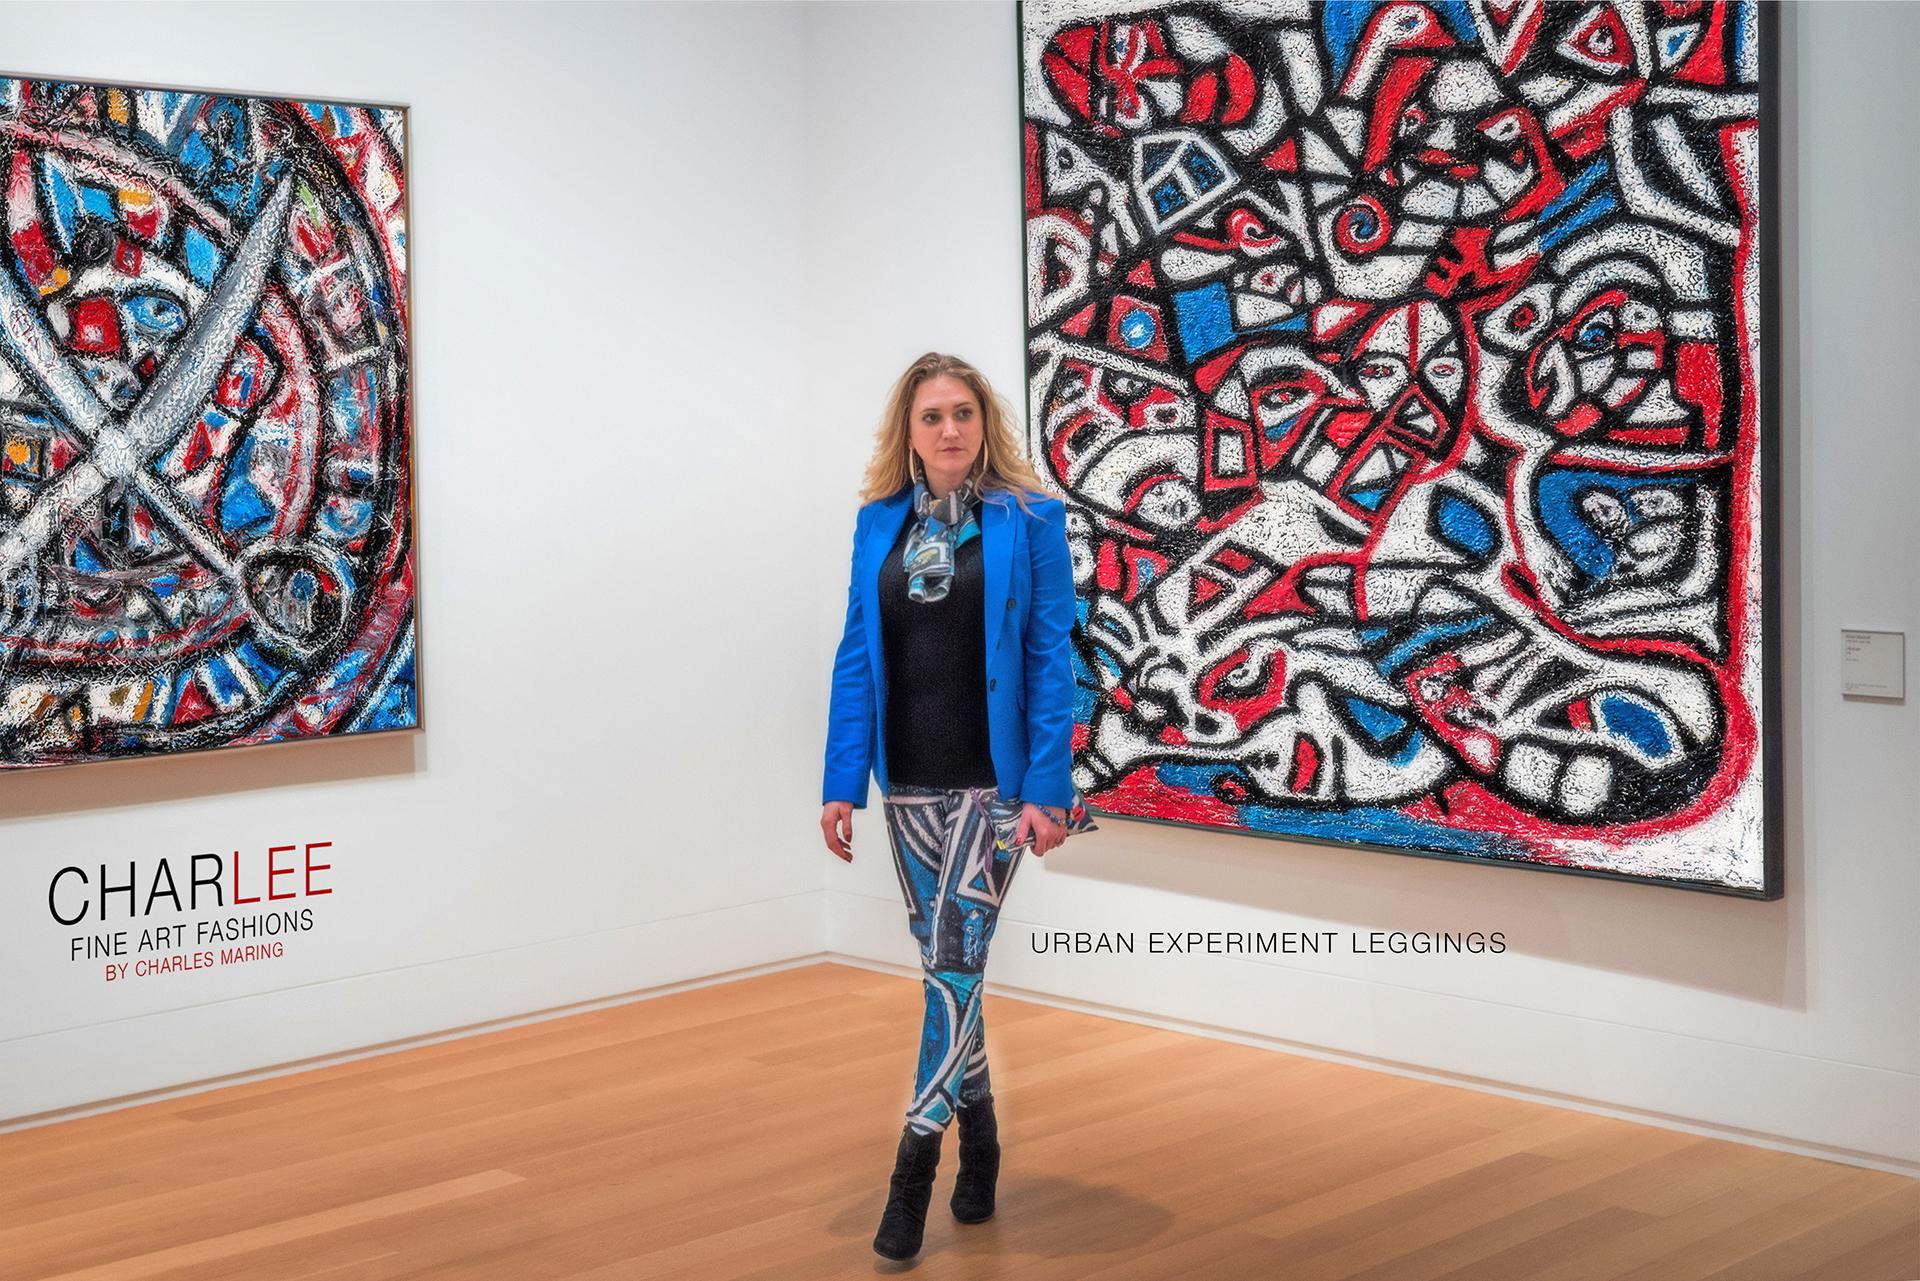 Charlee Urban Experiment Leggings and Paintings